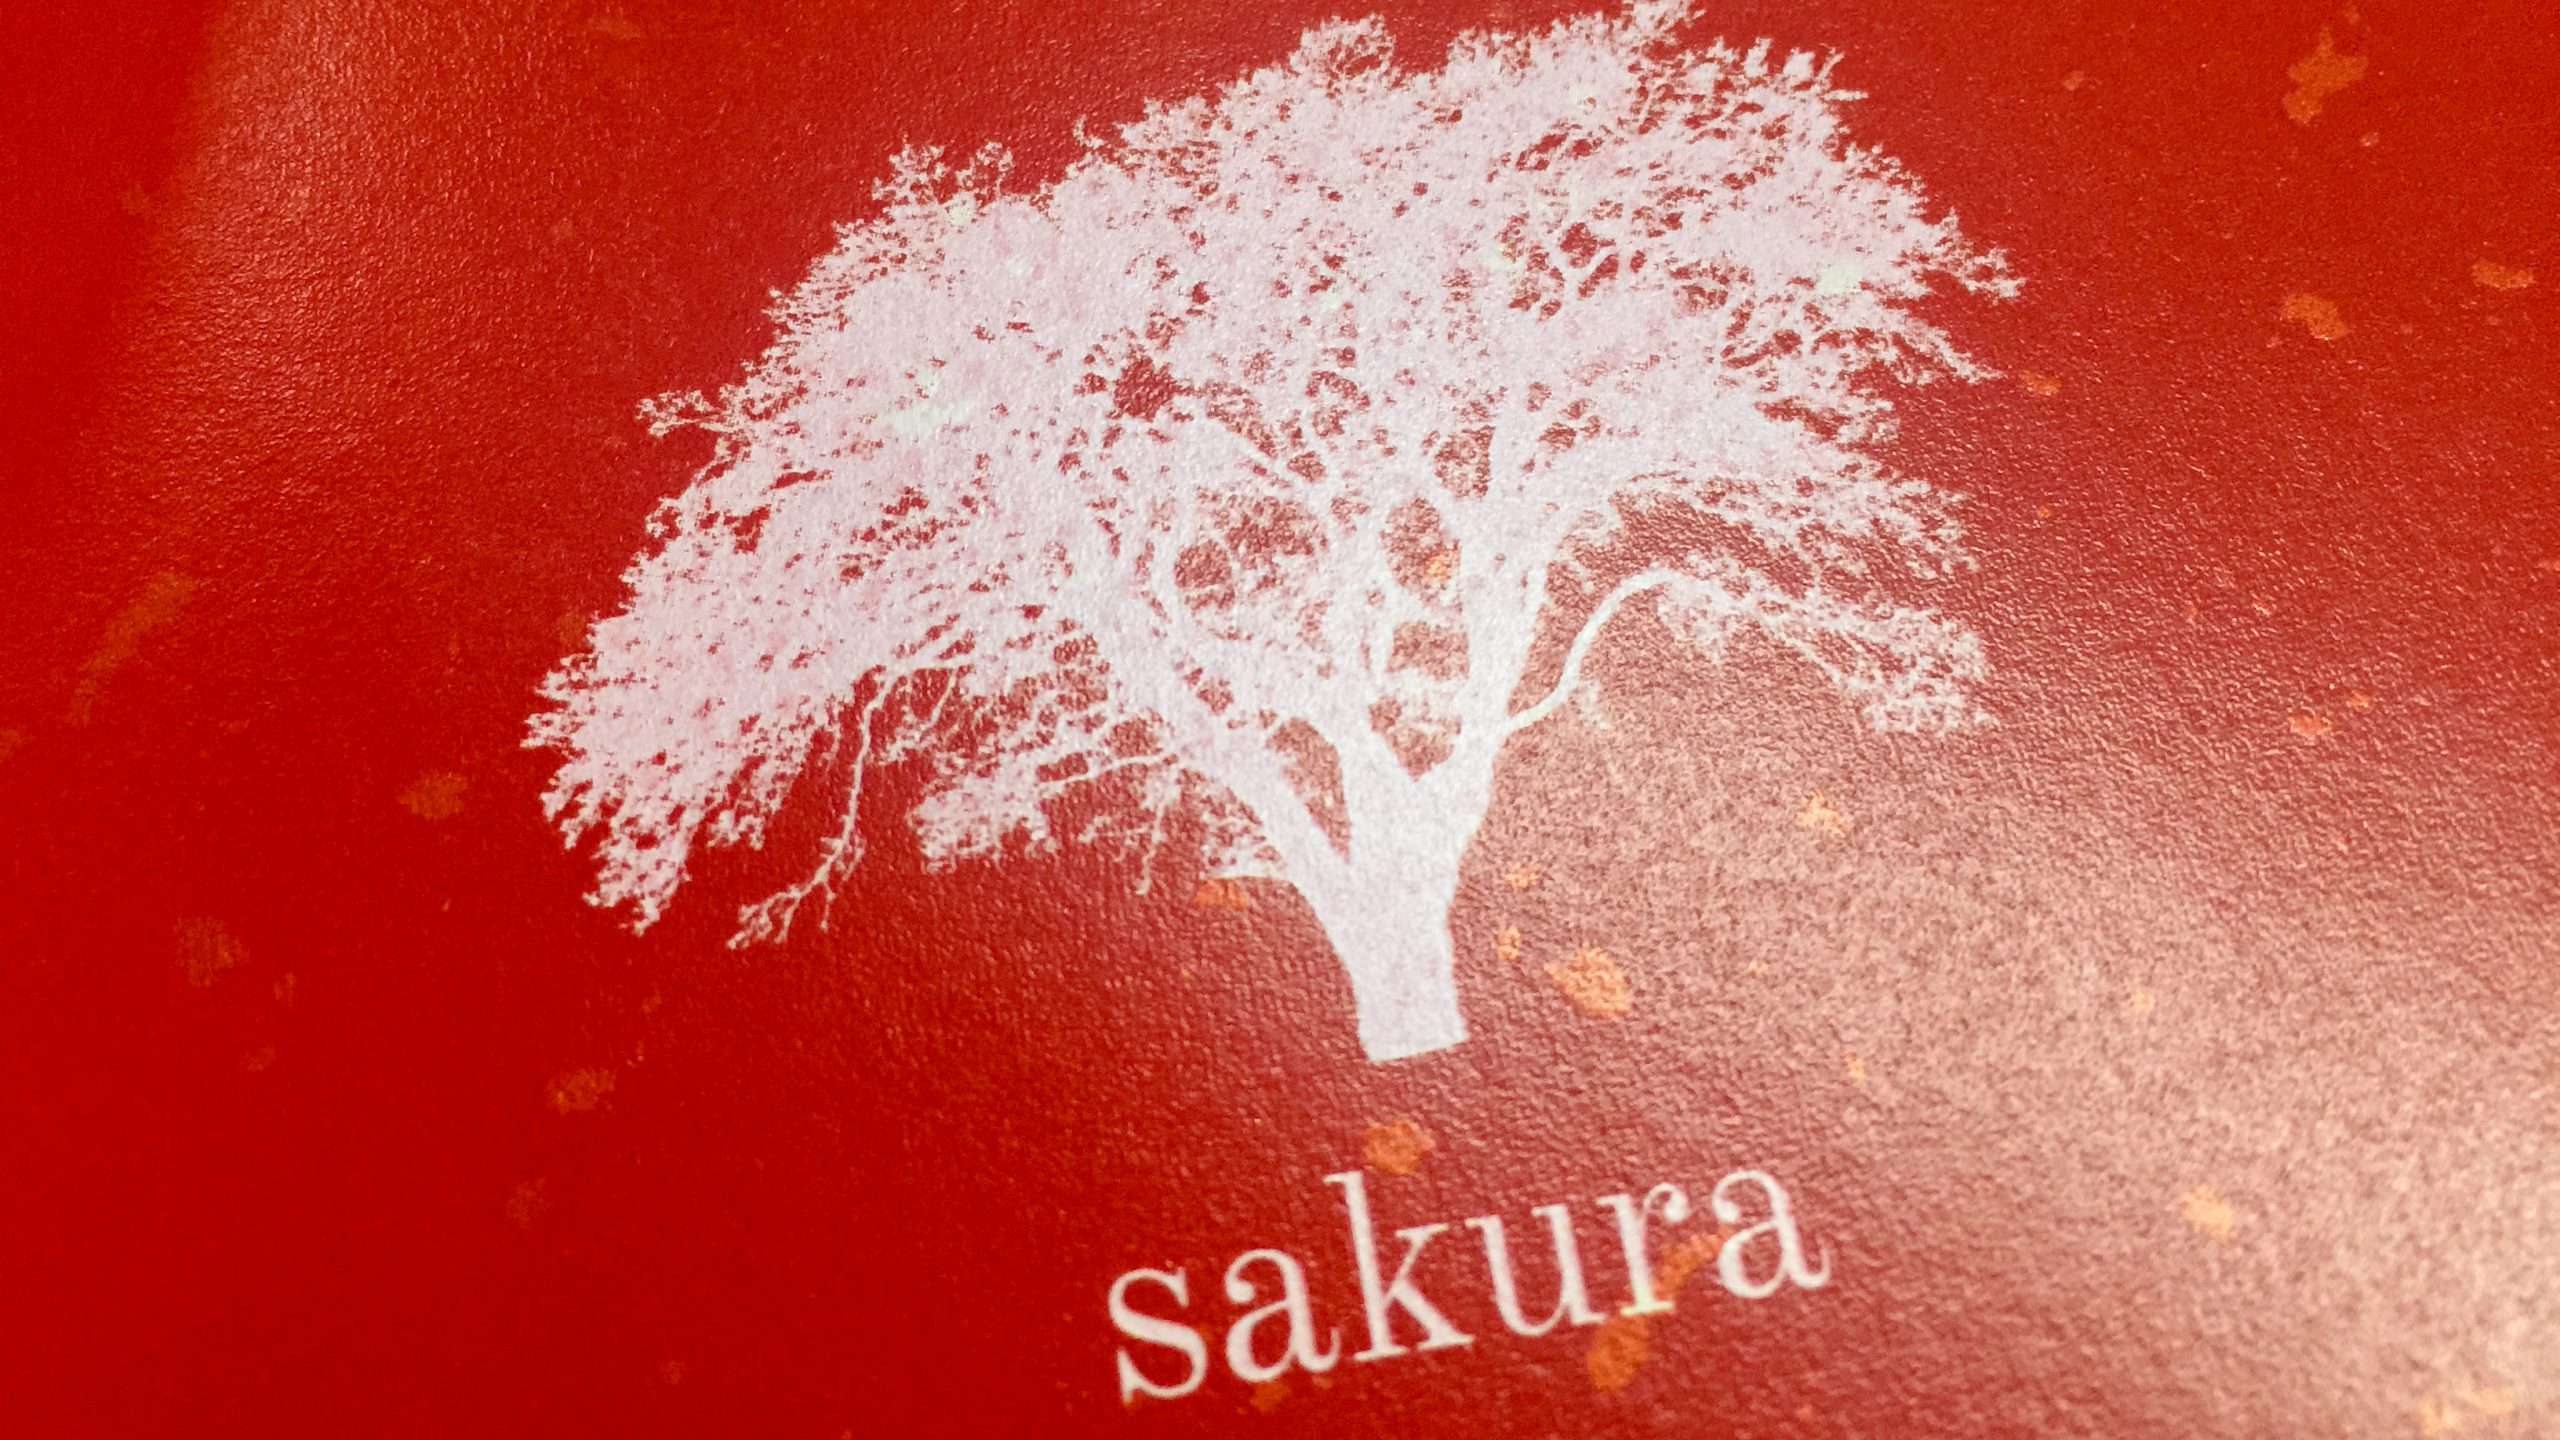 sakura tree red